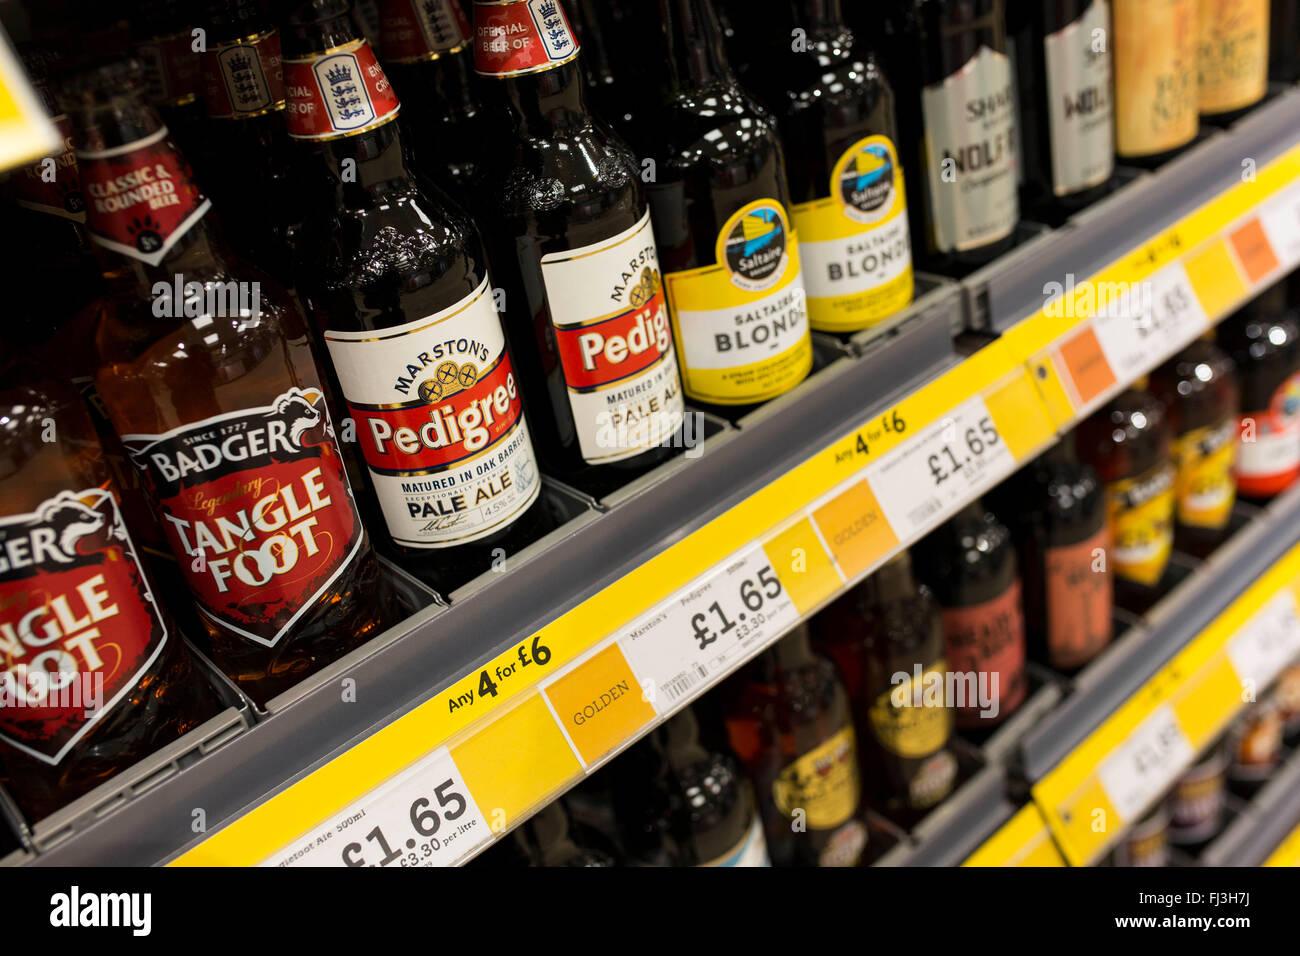 Beer on supermarket shelves - Stock Image